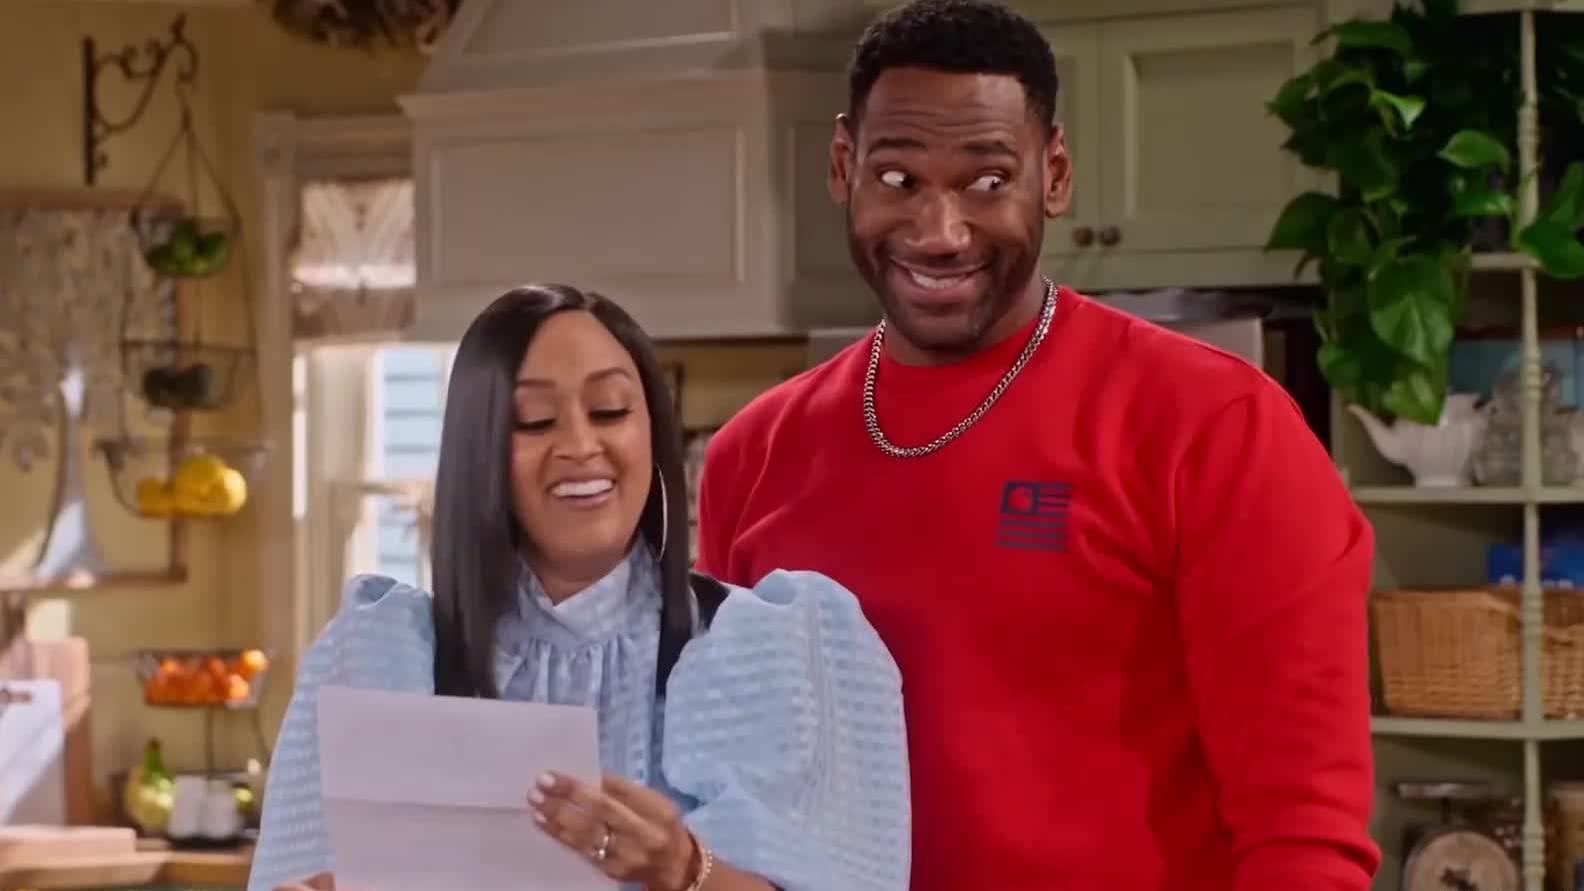 My family pies s2 e2 casrt Family Reunion Tv Series 2019 Imdb